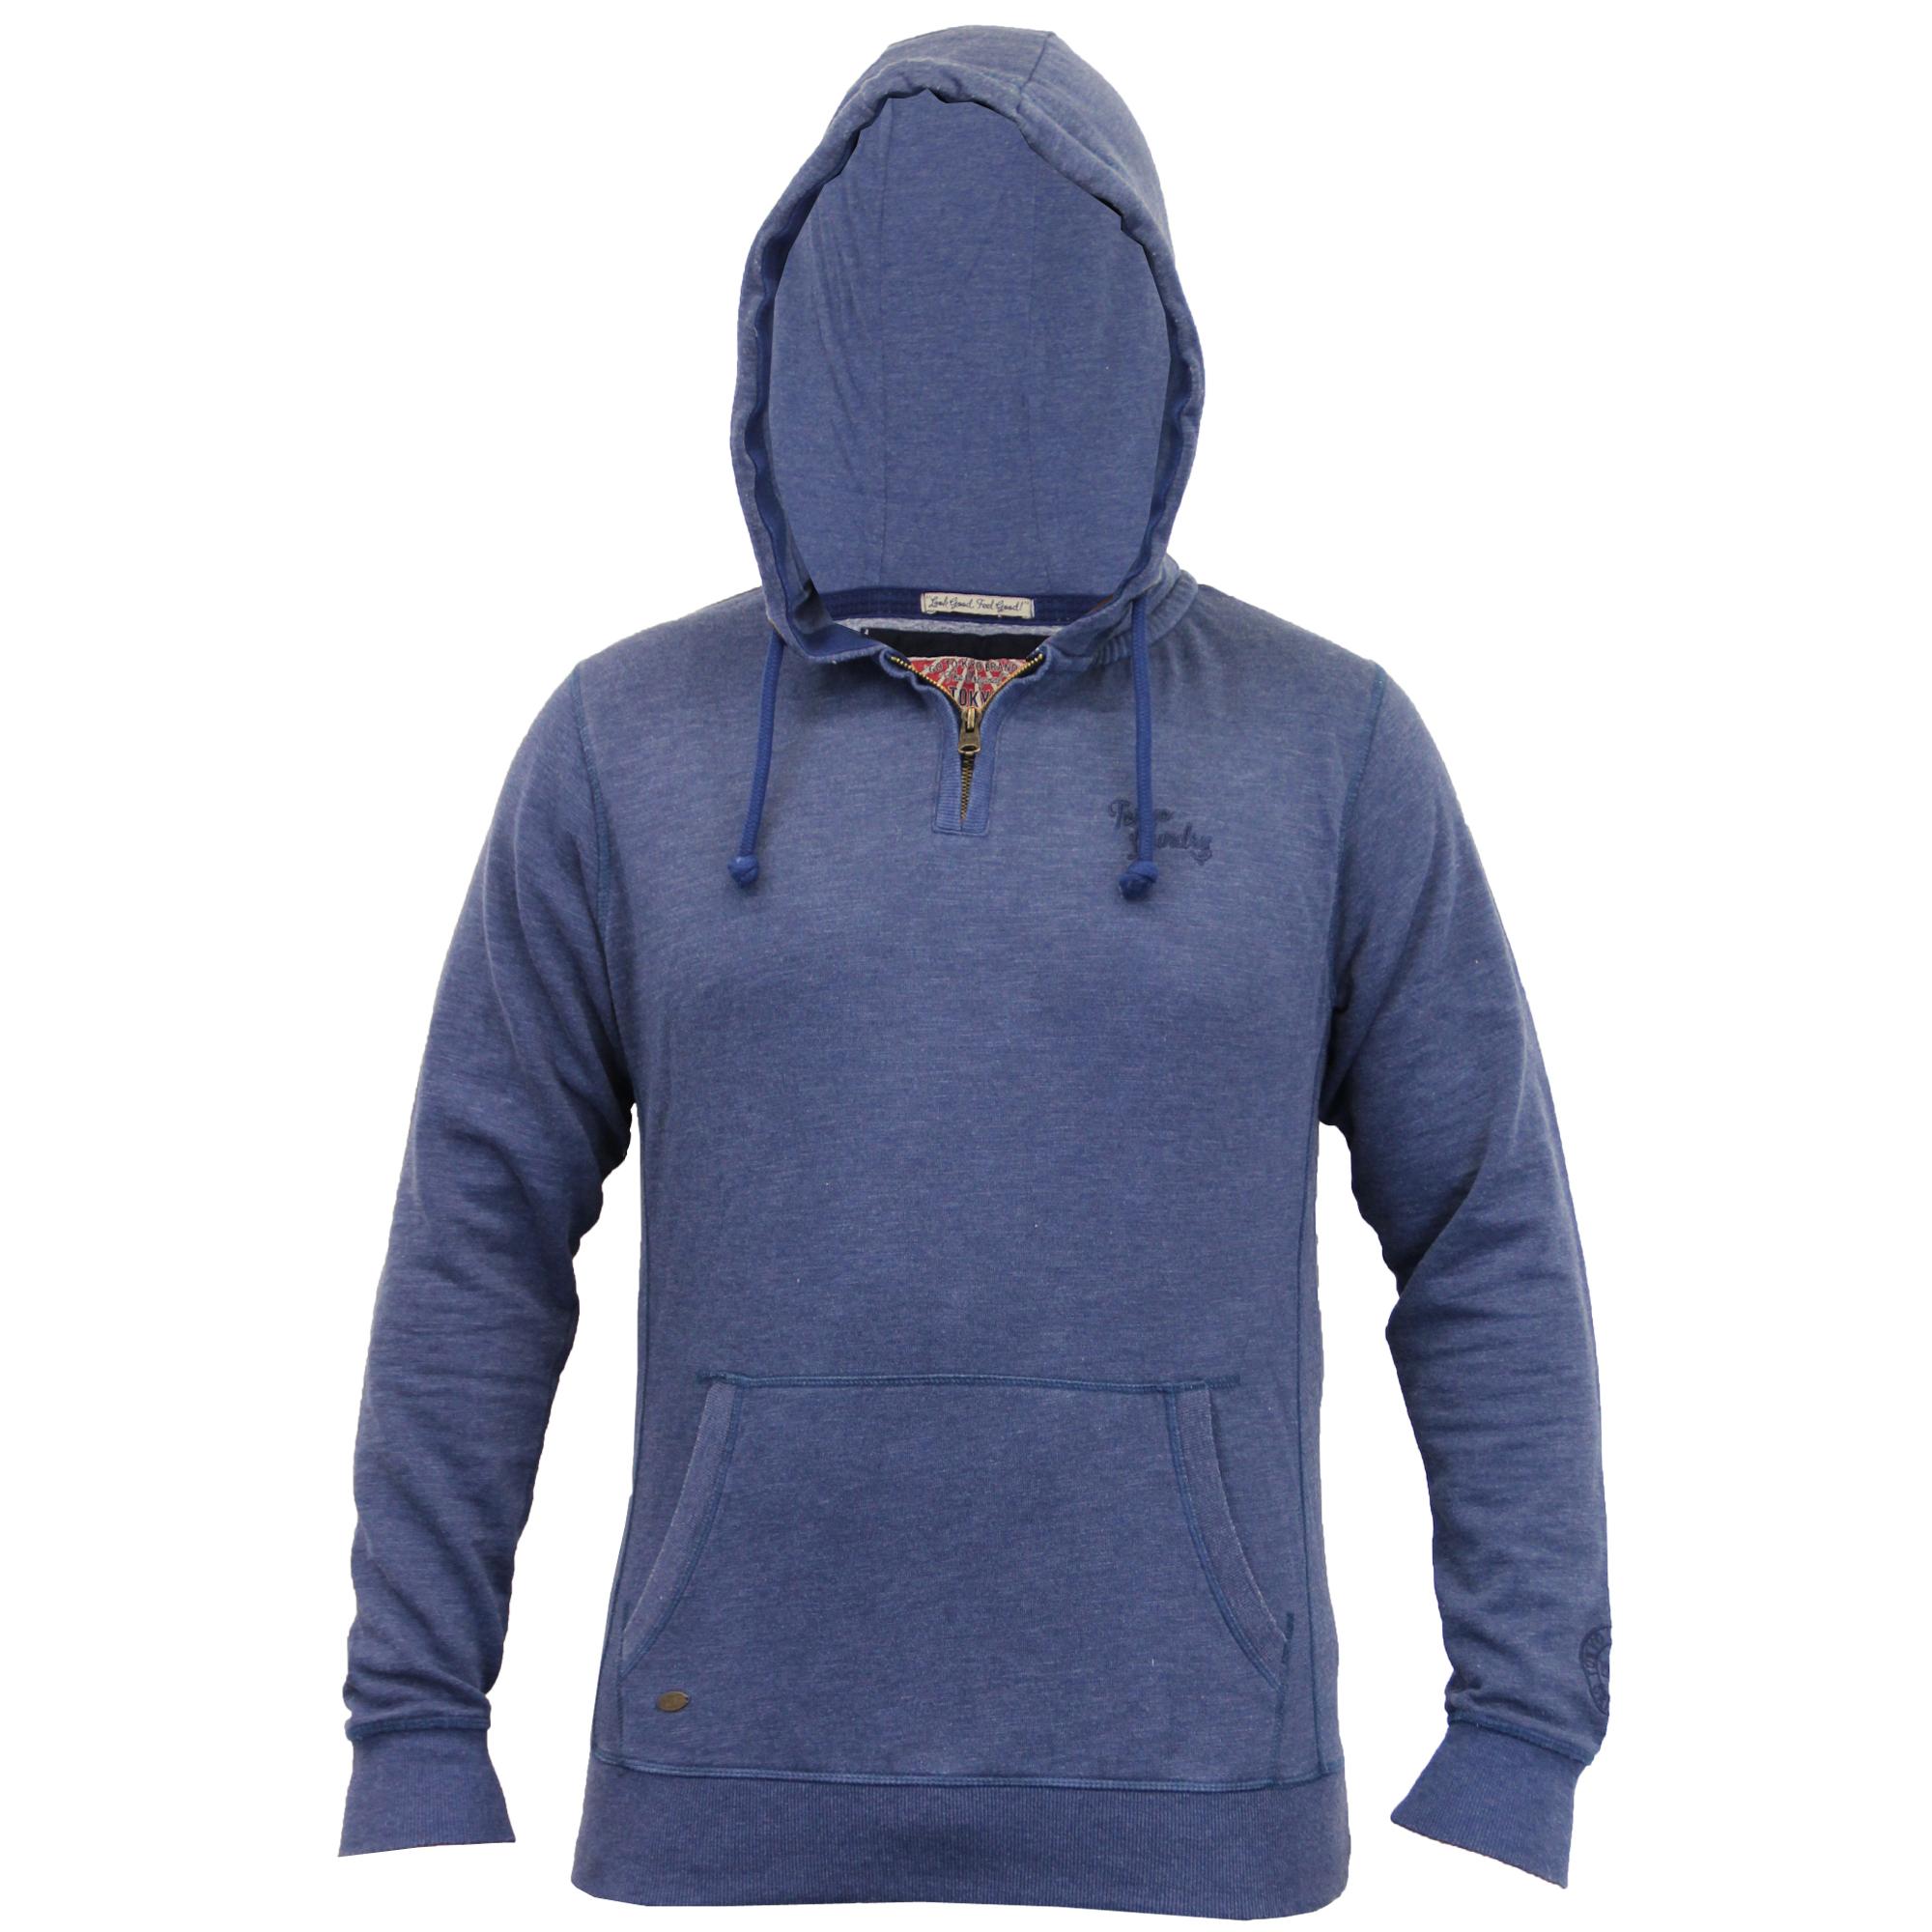 Mens-Sweatshirt-Tokyo-Laundry-Hooded-Top-Sweat-Applique-Zip-Gym-Fleece-Lined-New thumbnail 4